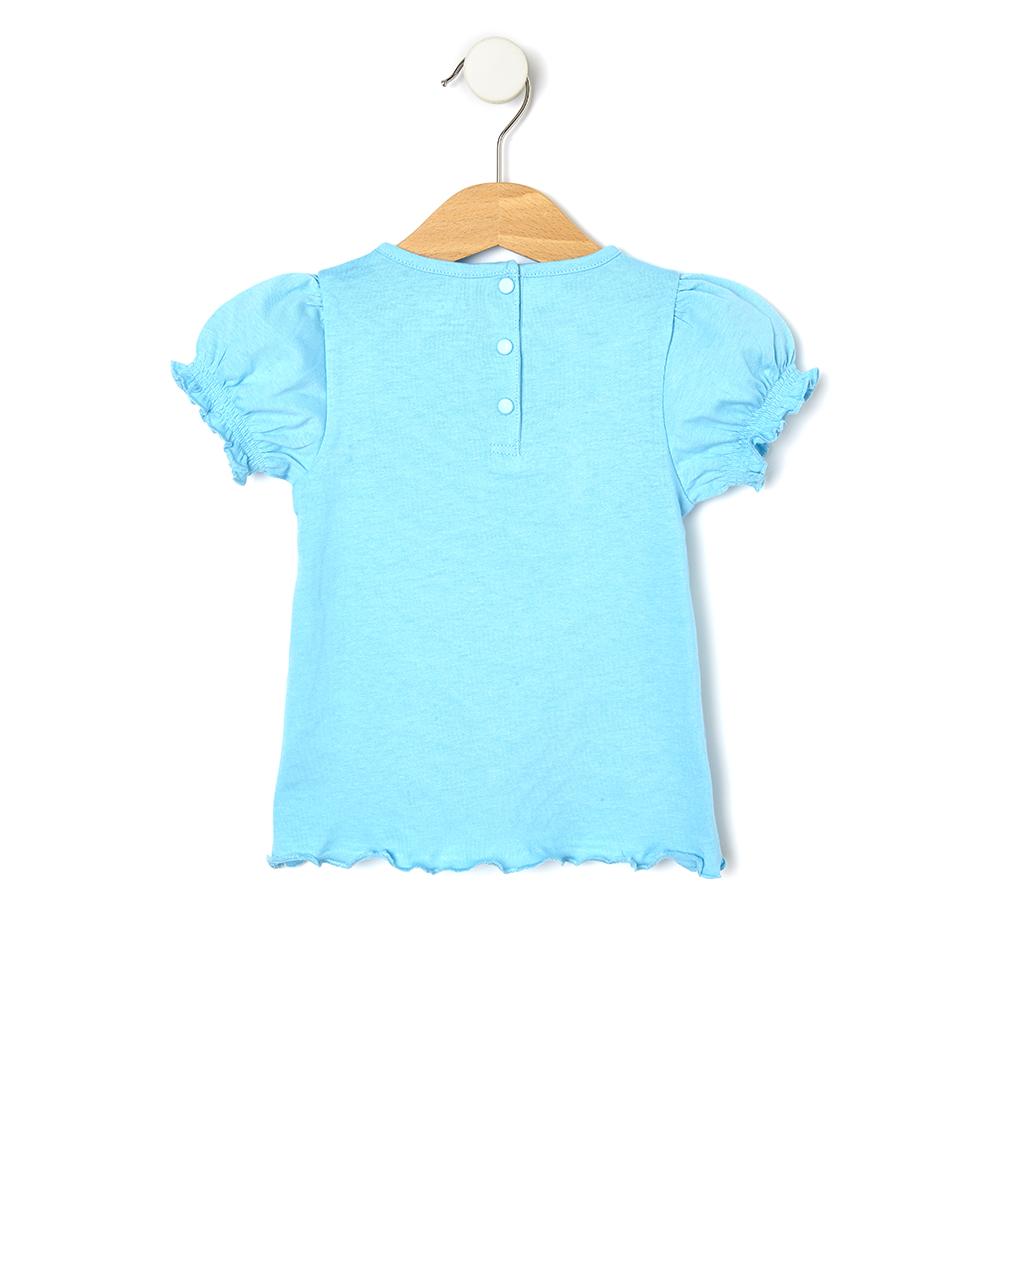 T-shirt con maniche a sbuffo - Prénatal